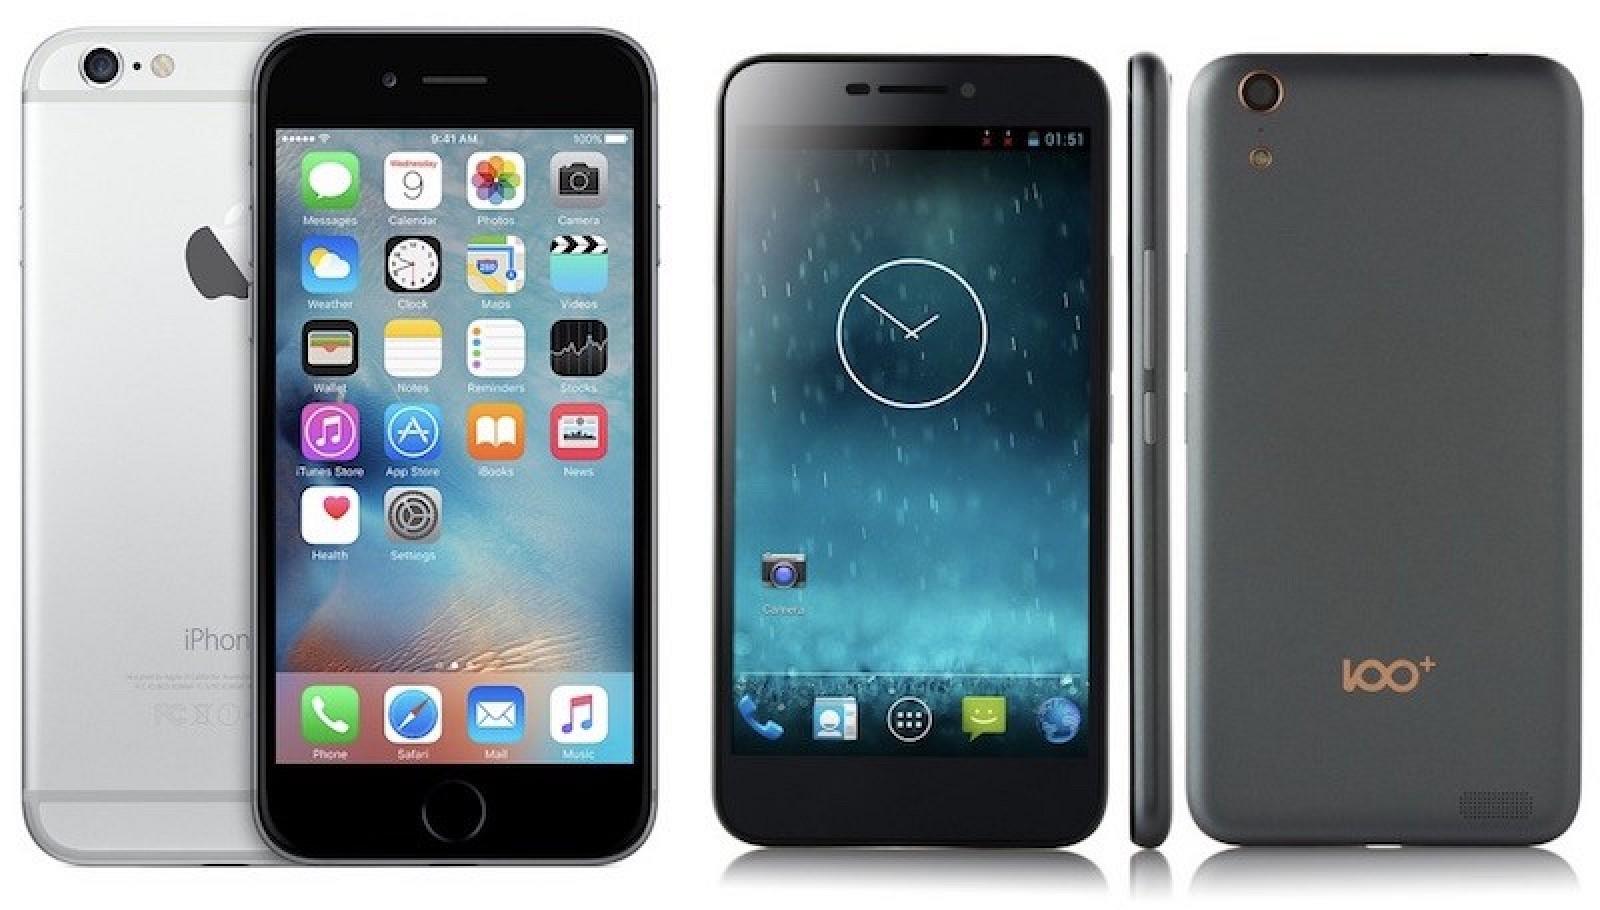 Iphone 6 Gewinnspiel Seriös